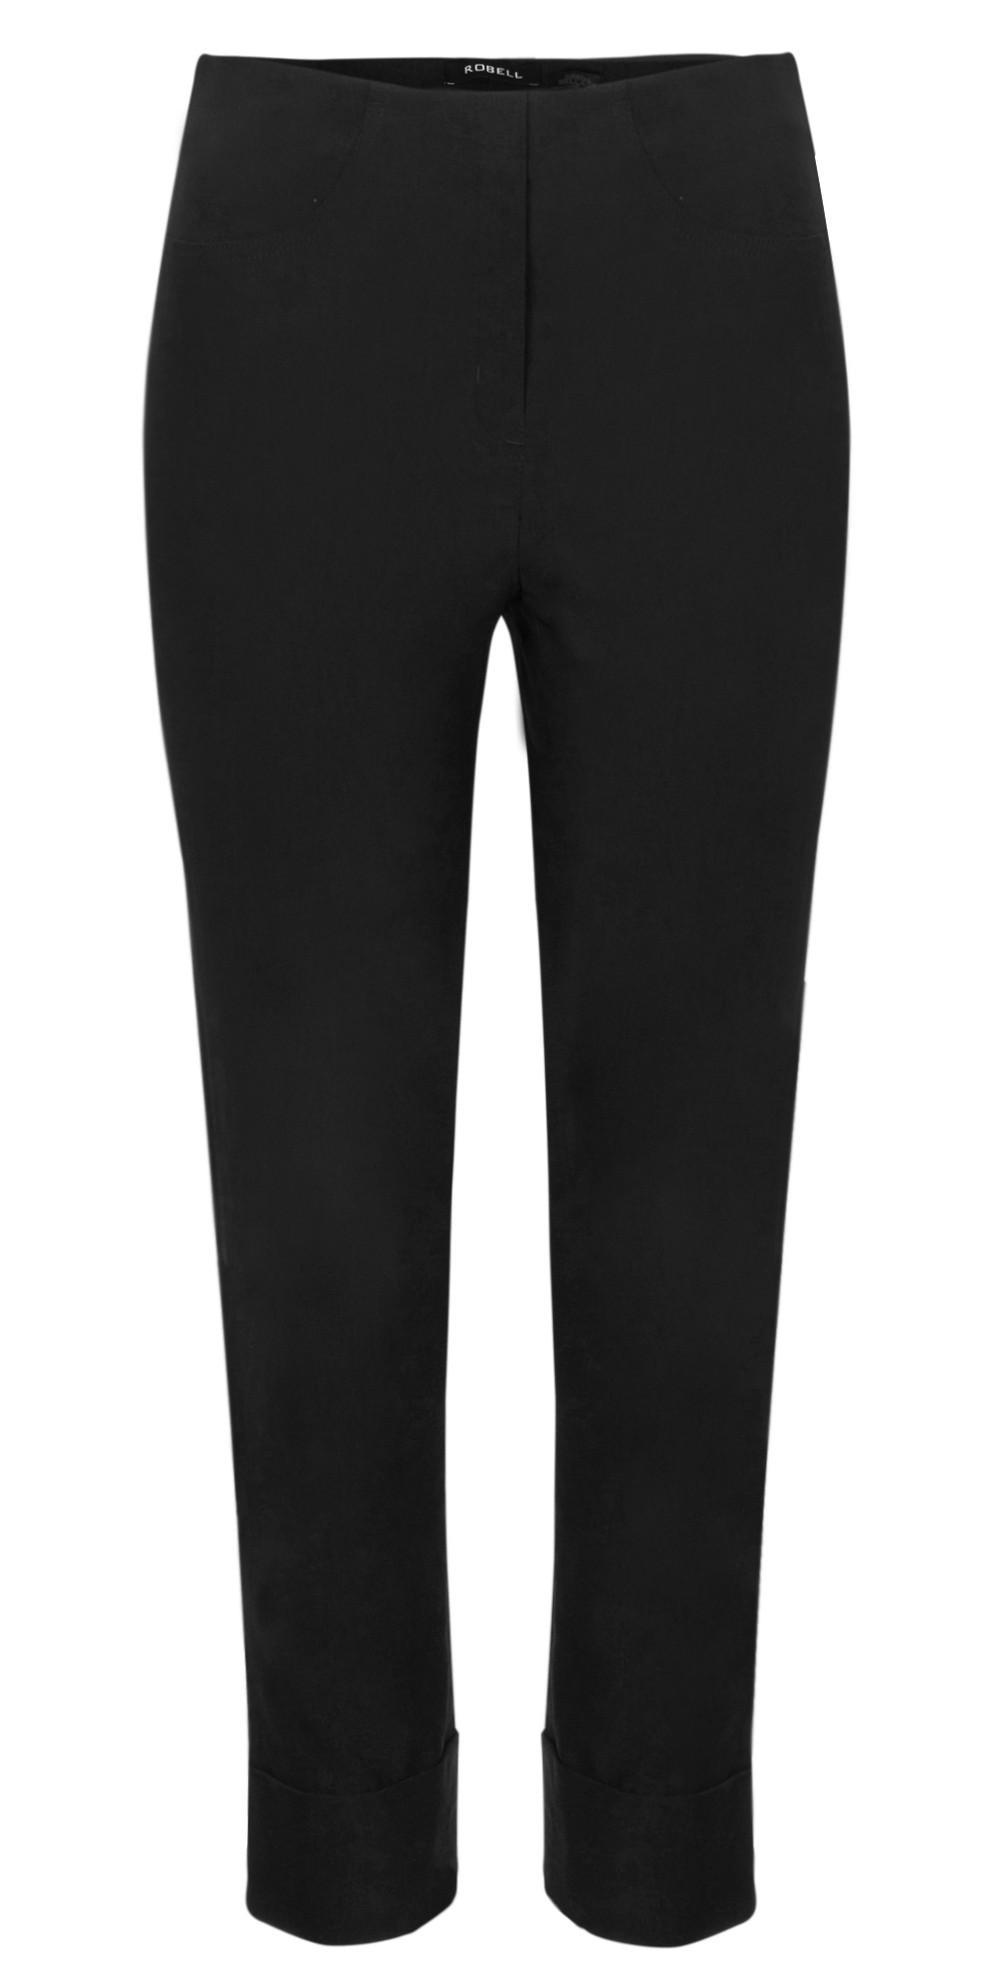 Bella 09 Black Ankle Length Crop Cuff Trouser main image